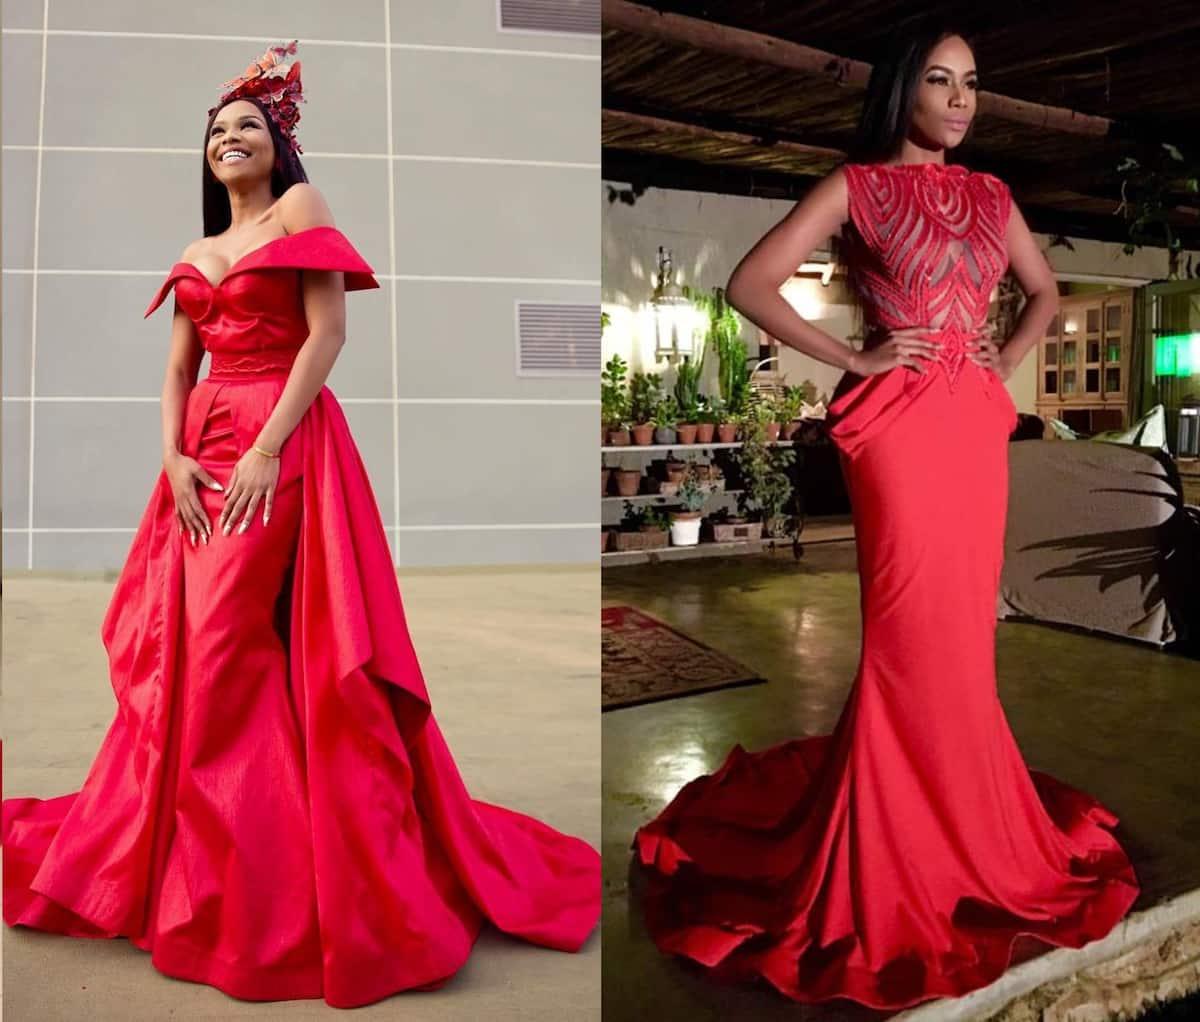 Bonang Matheba dresses Matric ball dresses 2018 Matric dresses 2018 Dresses for matric dance Spree.co.za dresses